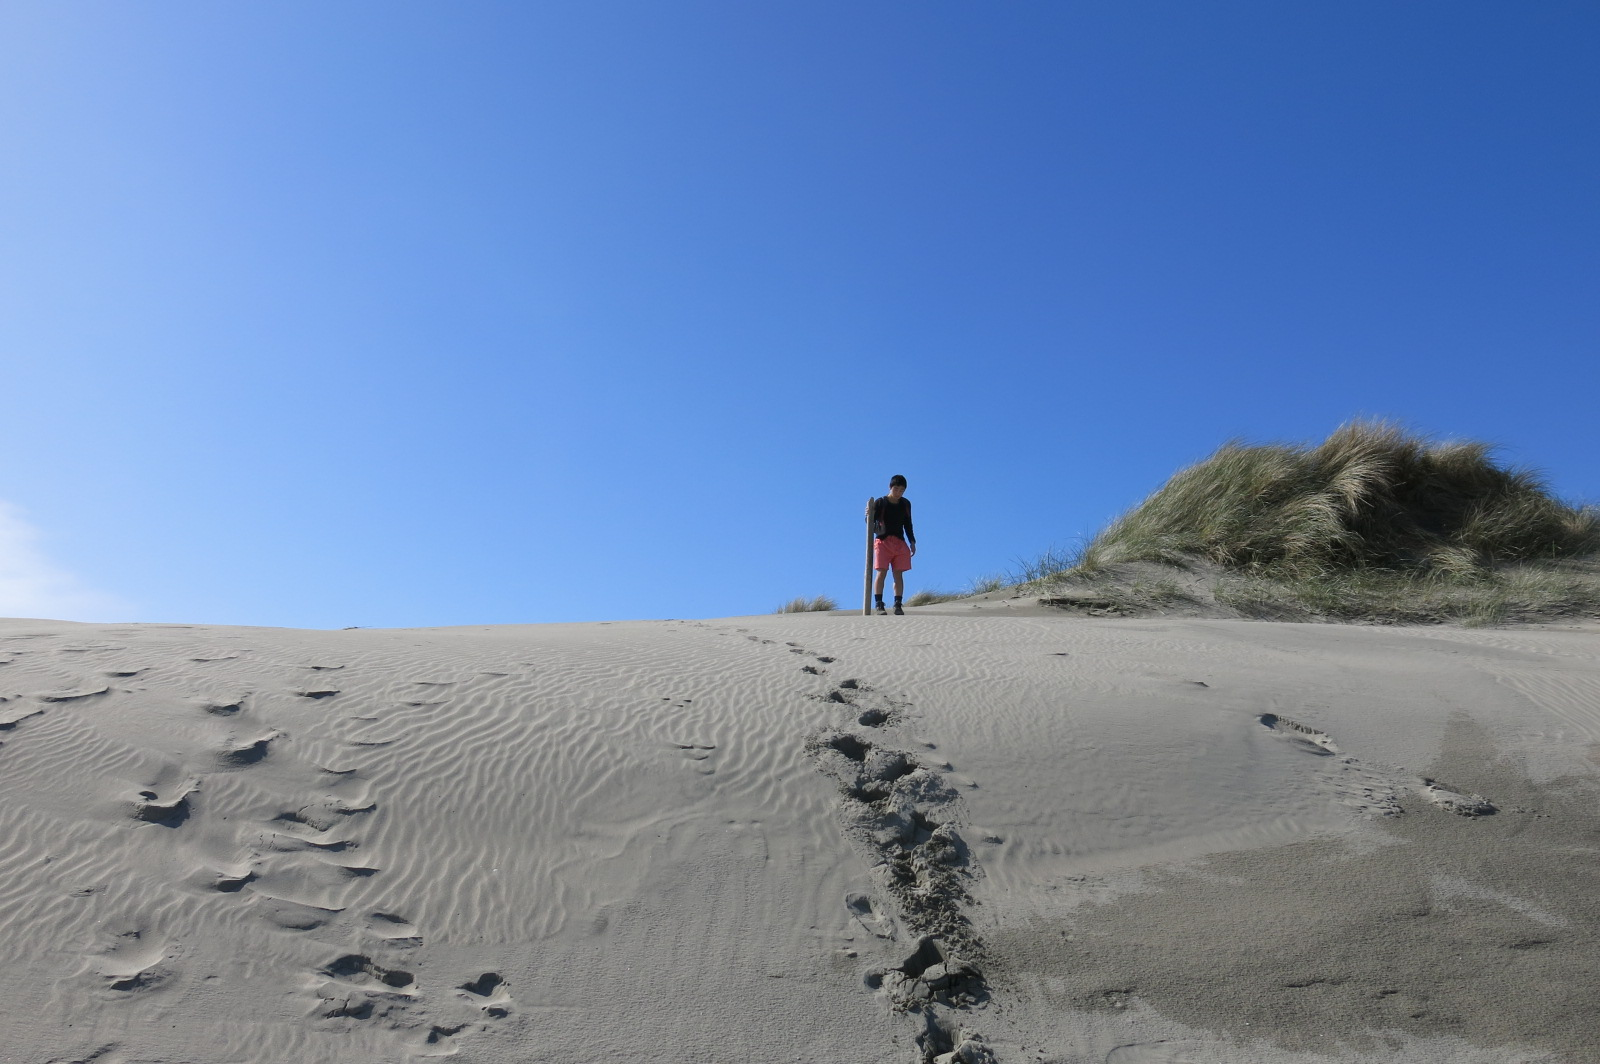 Golden Bay, Sand Dune /フェアウェルスピットにある砂丘